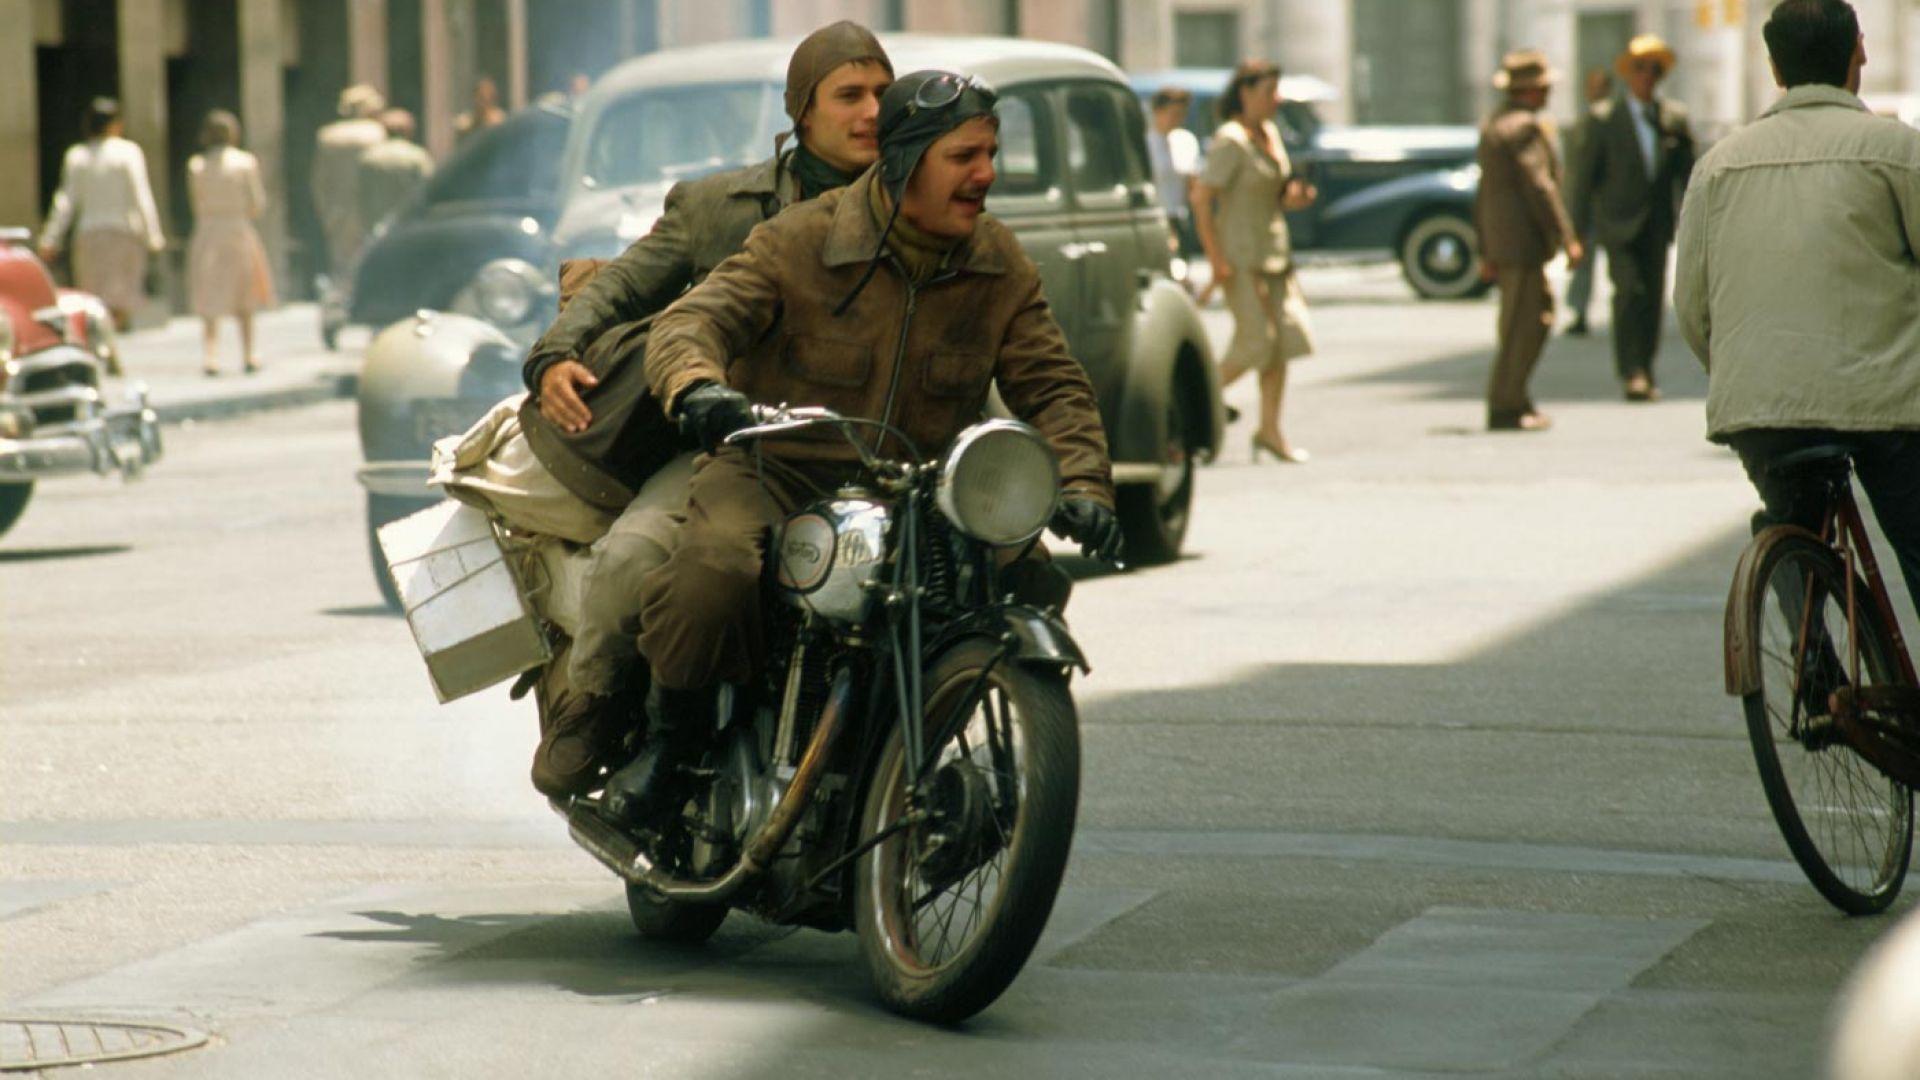 Че Гевара: Дневники мотоциклиста смотреть фото